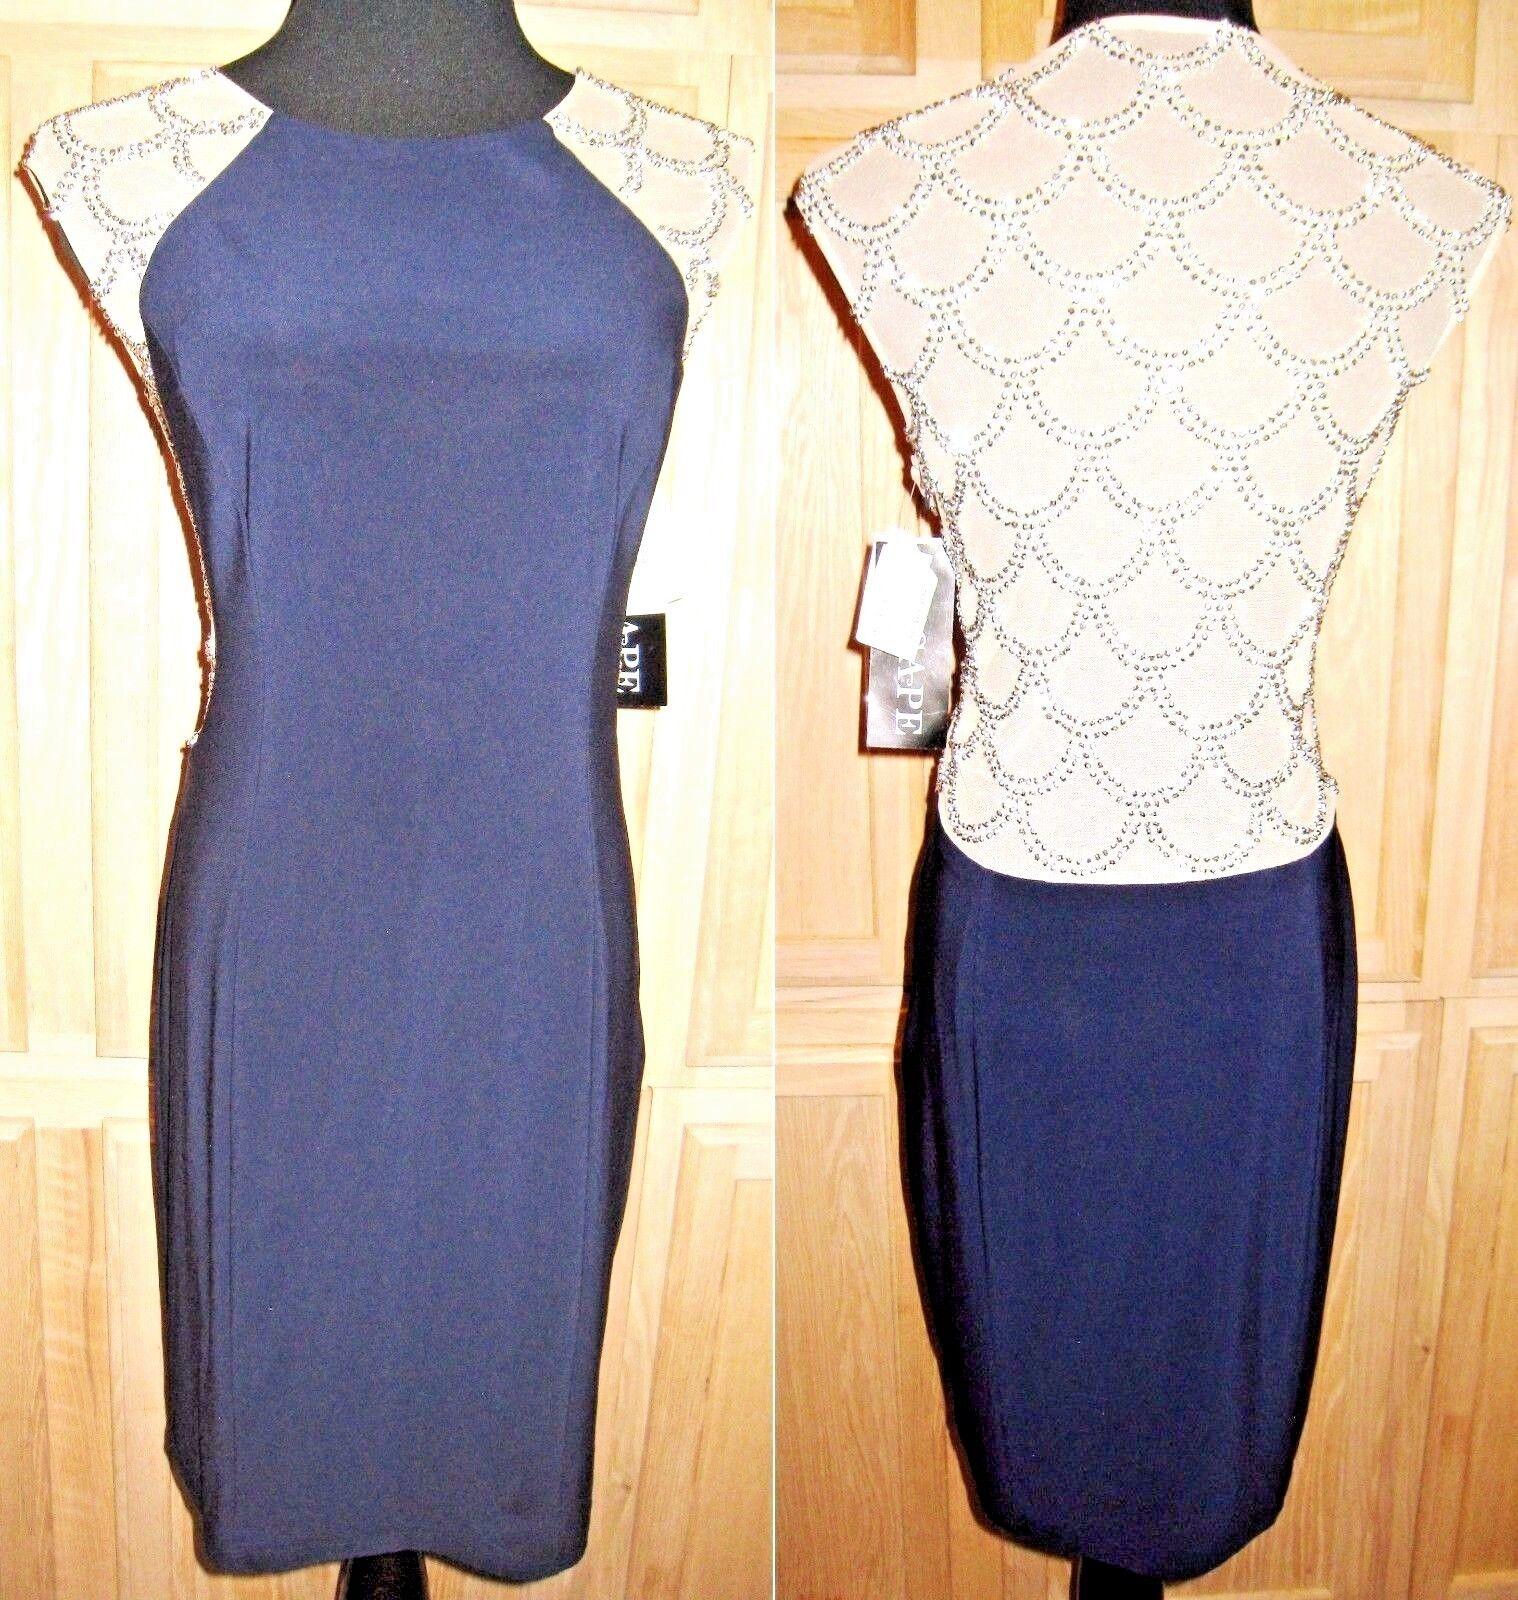 Xscape XS6489 Navy Bead Detail Contrast Stretch Jersey Sheath Dress, 14R -